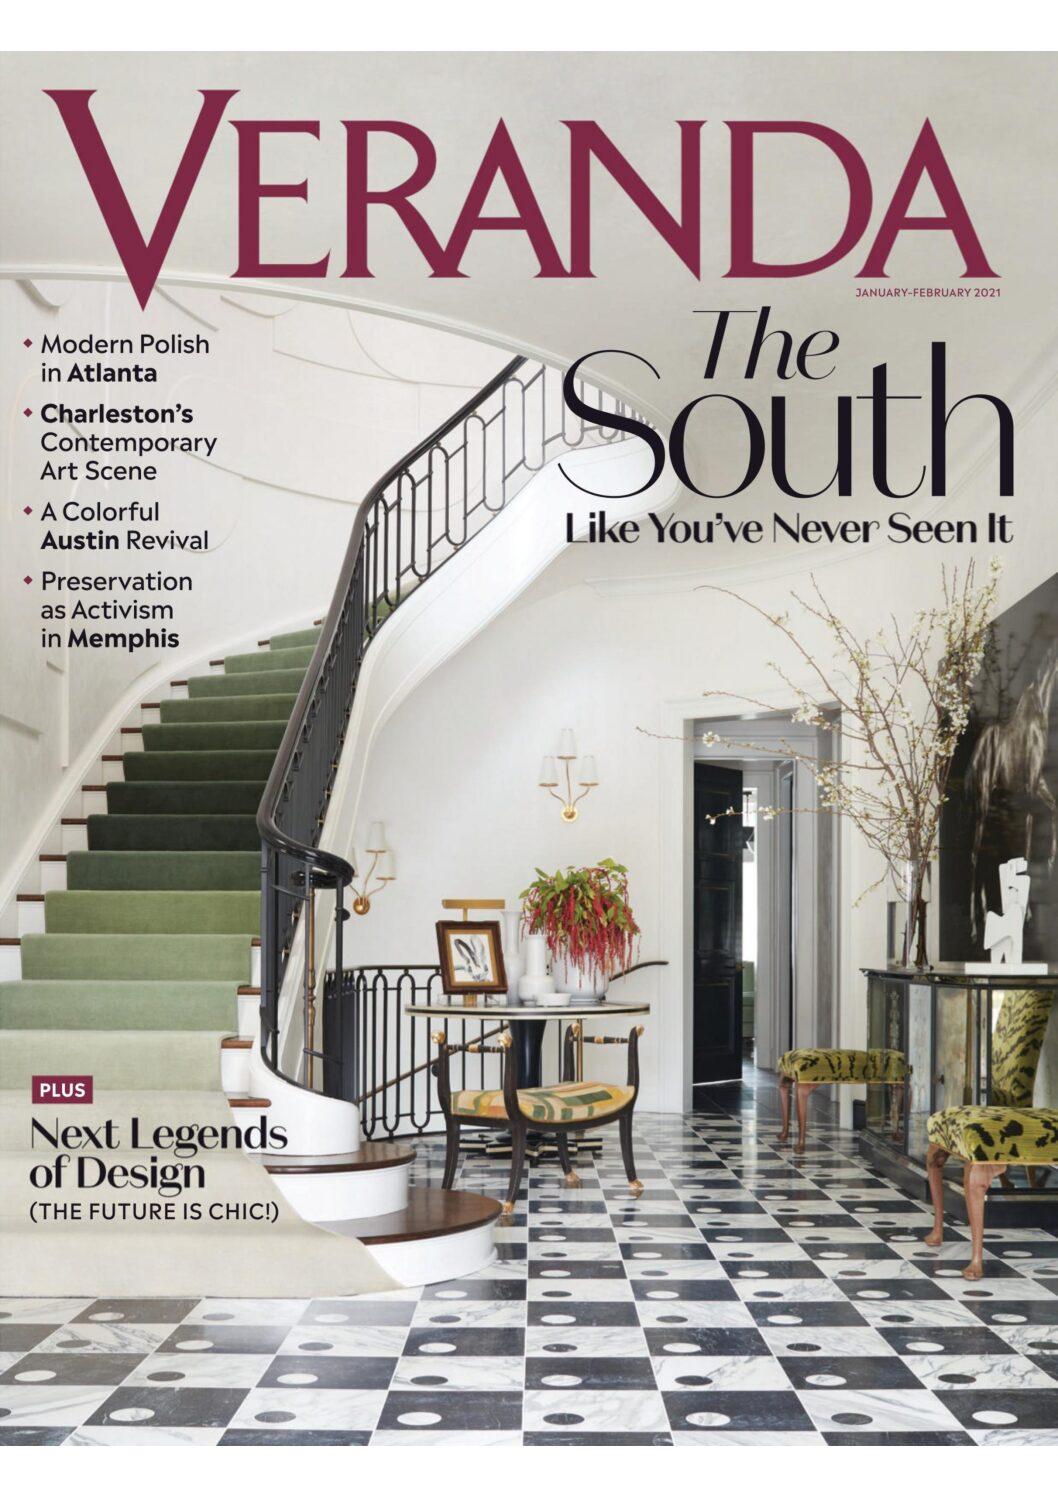 Veranda, January/February 2021